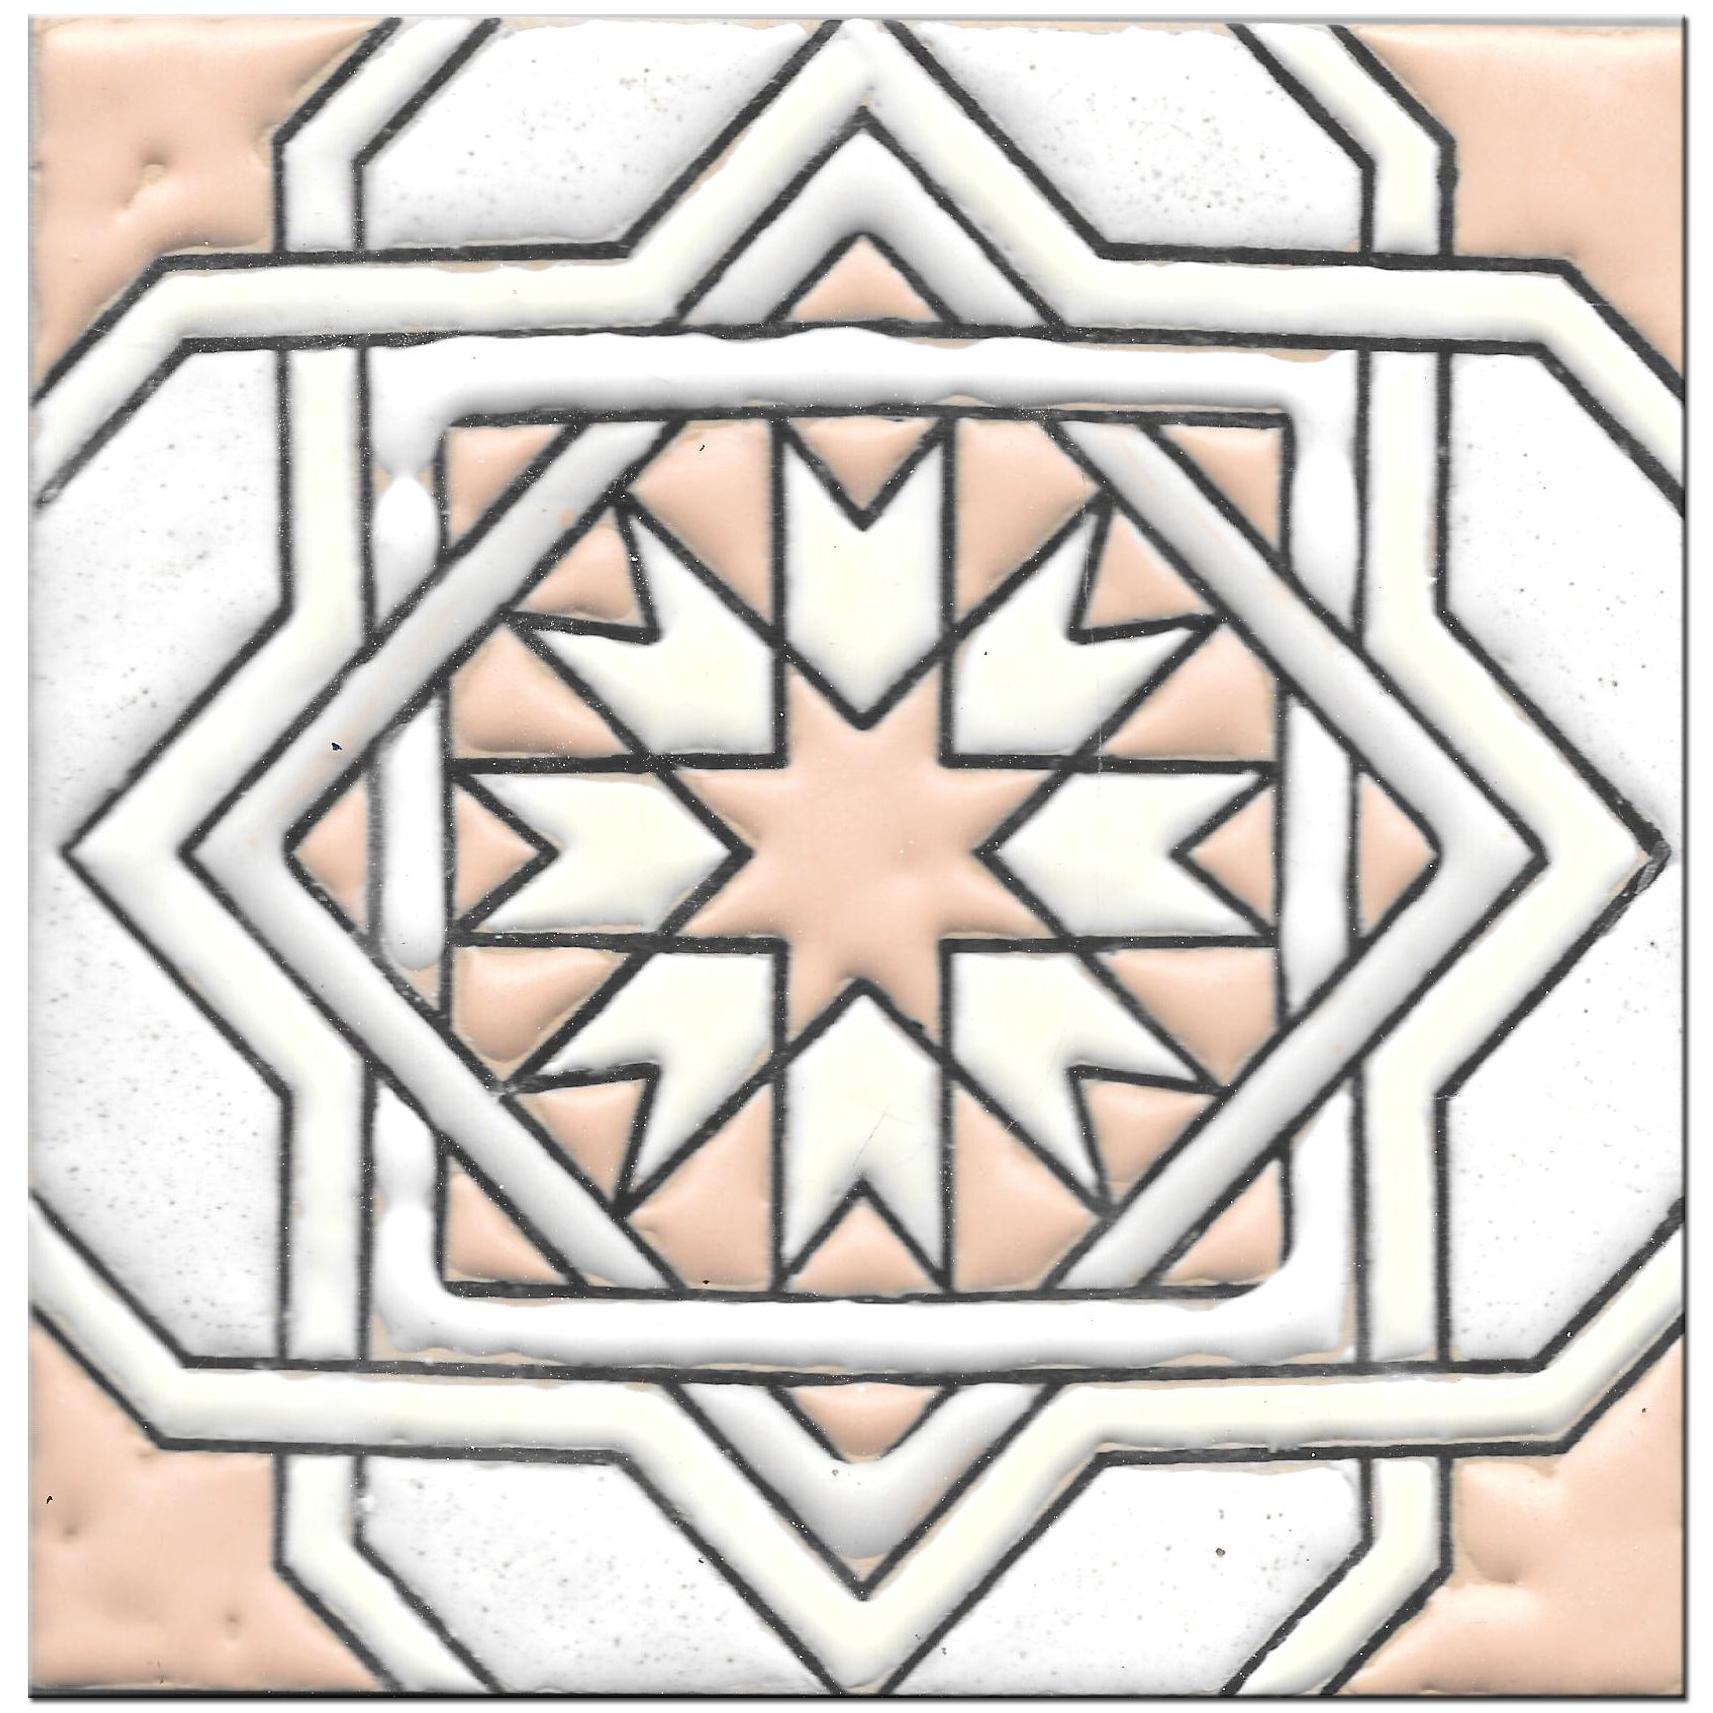 Handmade tile 14x14cm - Hispanic Arabic 3 - Color A